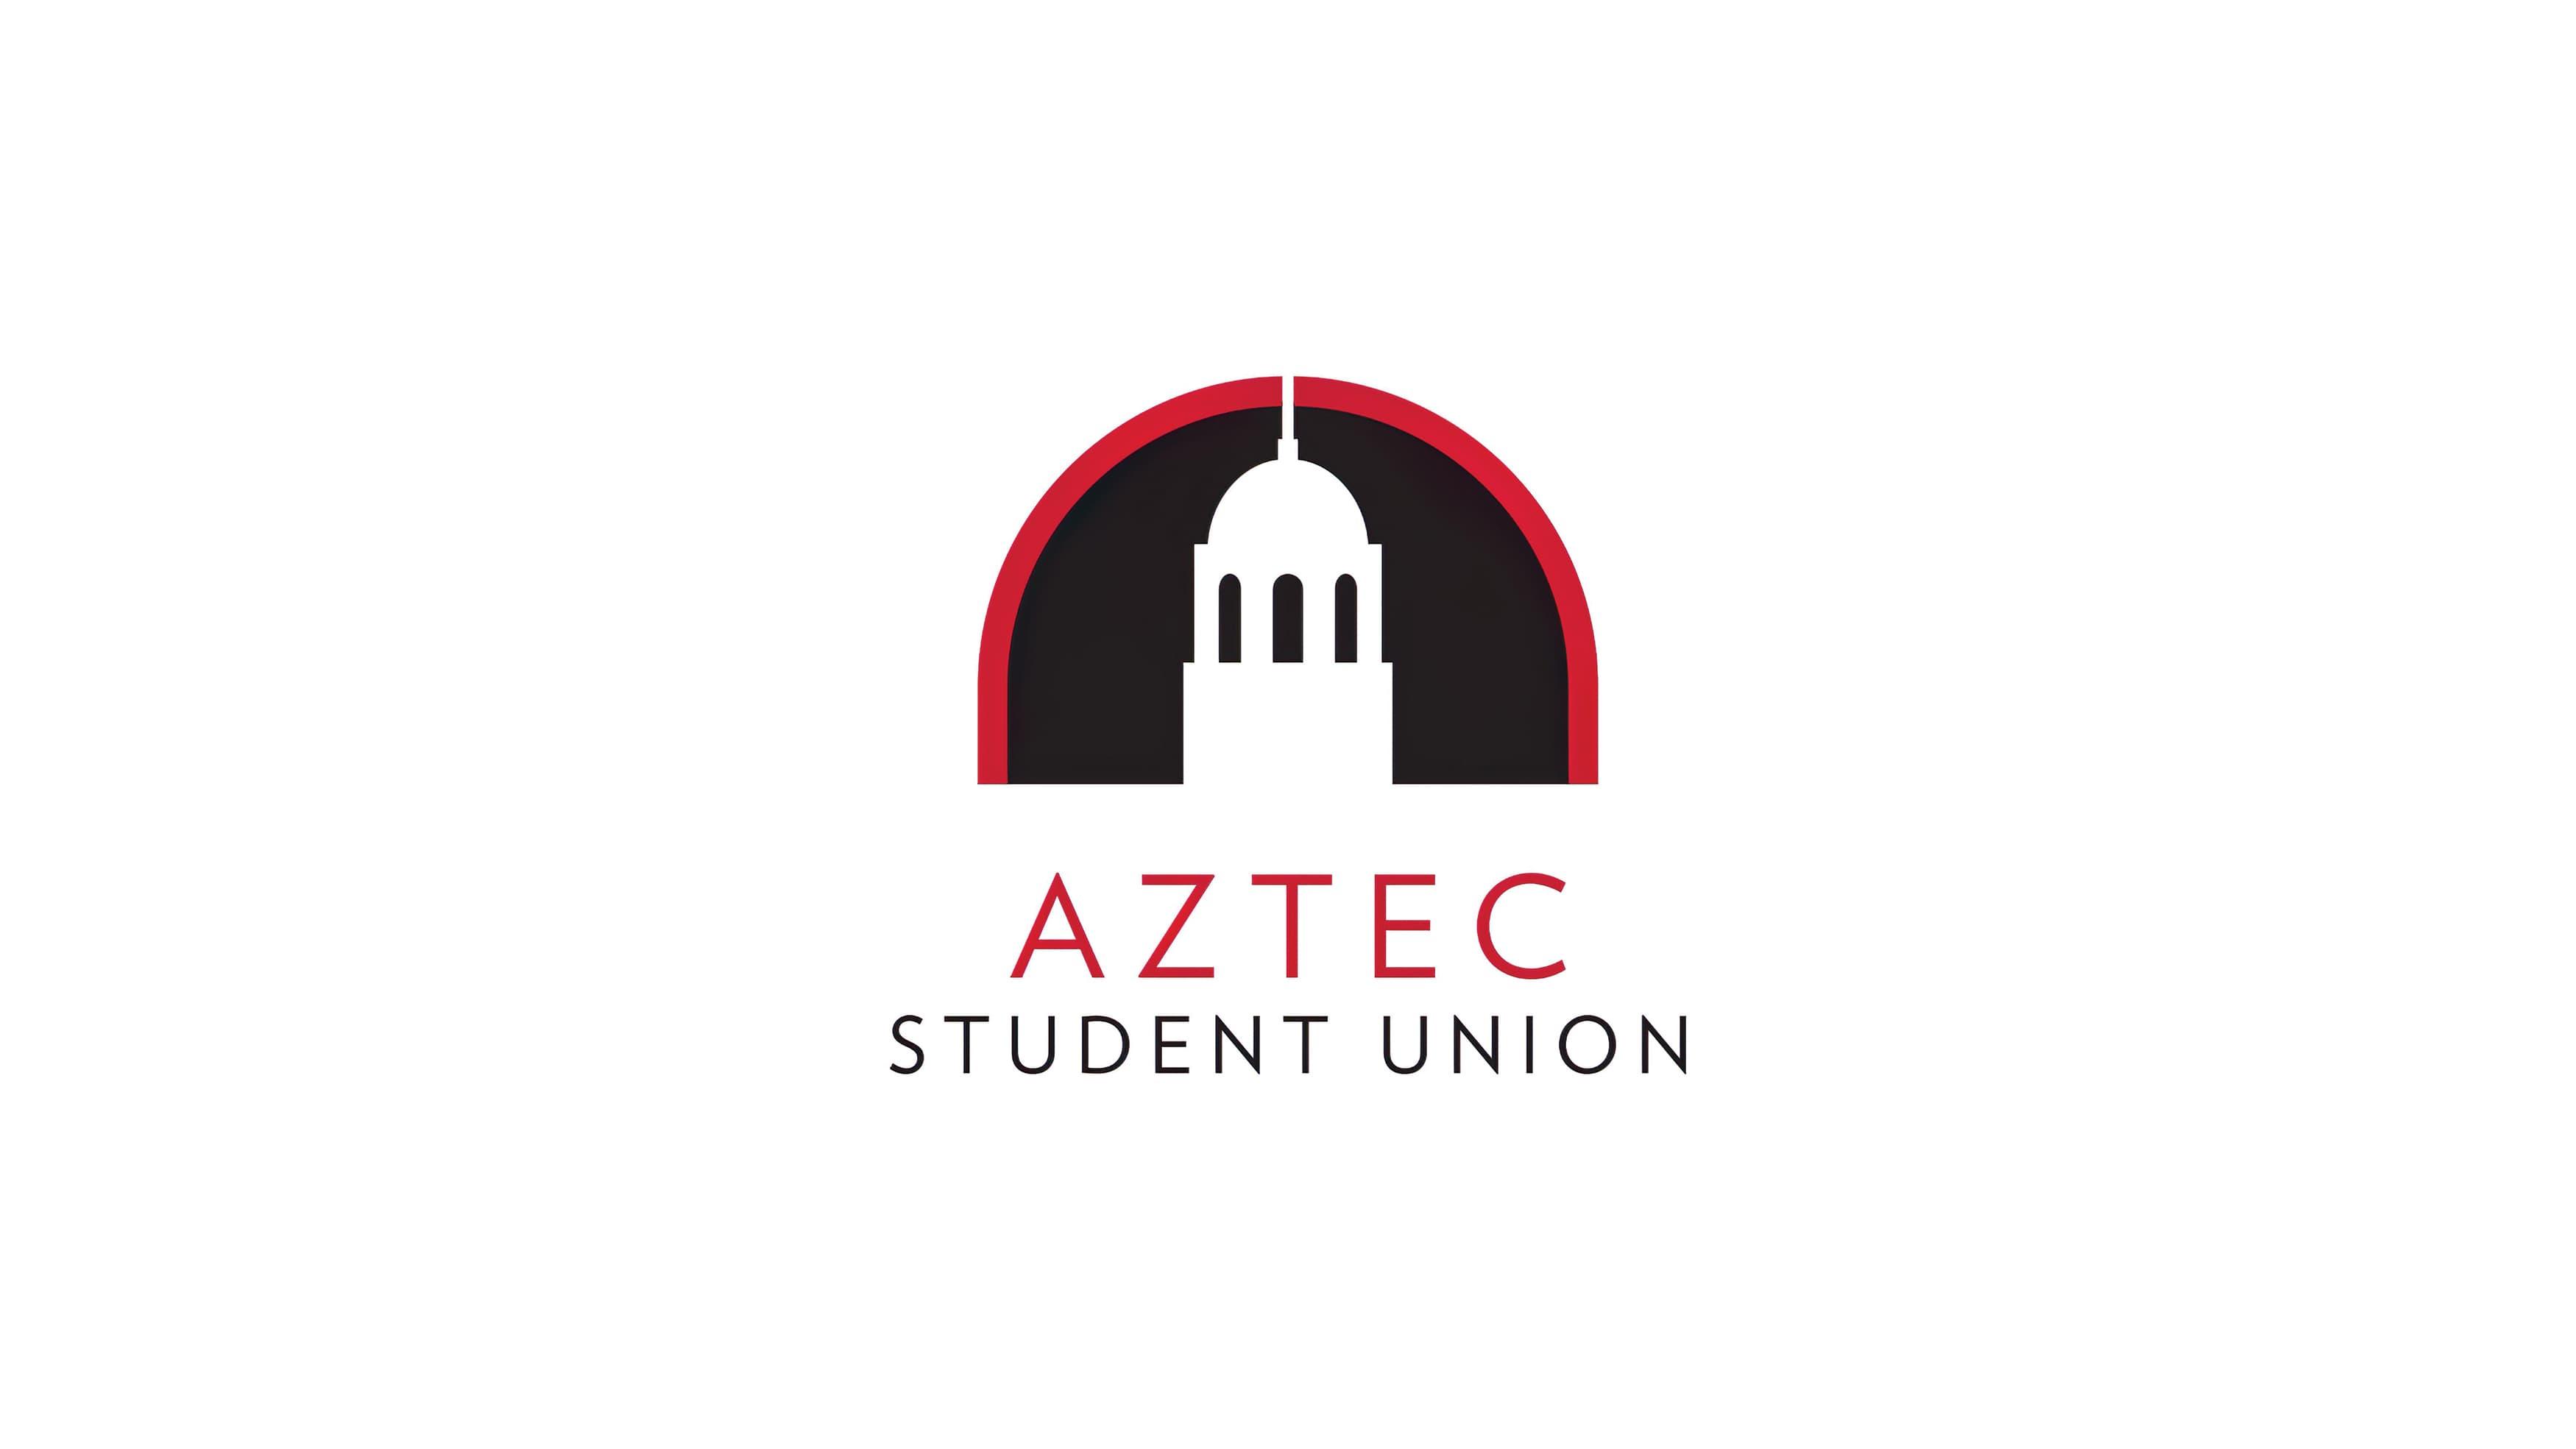 San Diego State University Student Union brand logo and mark